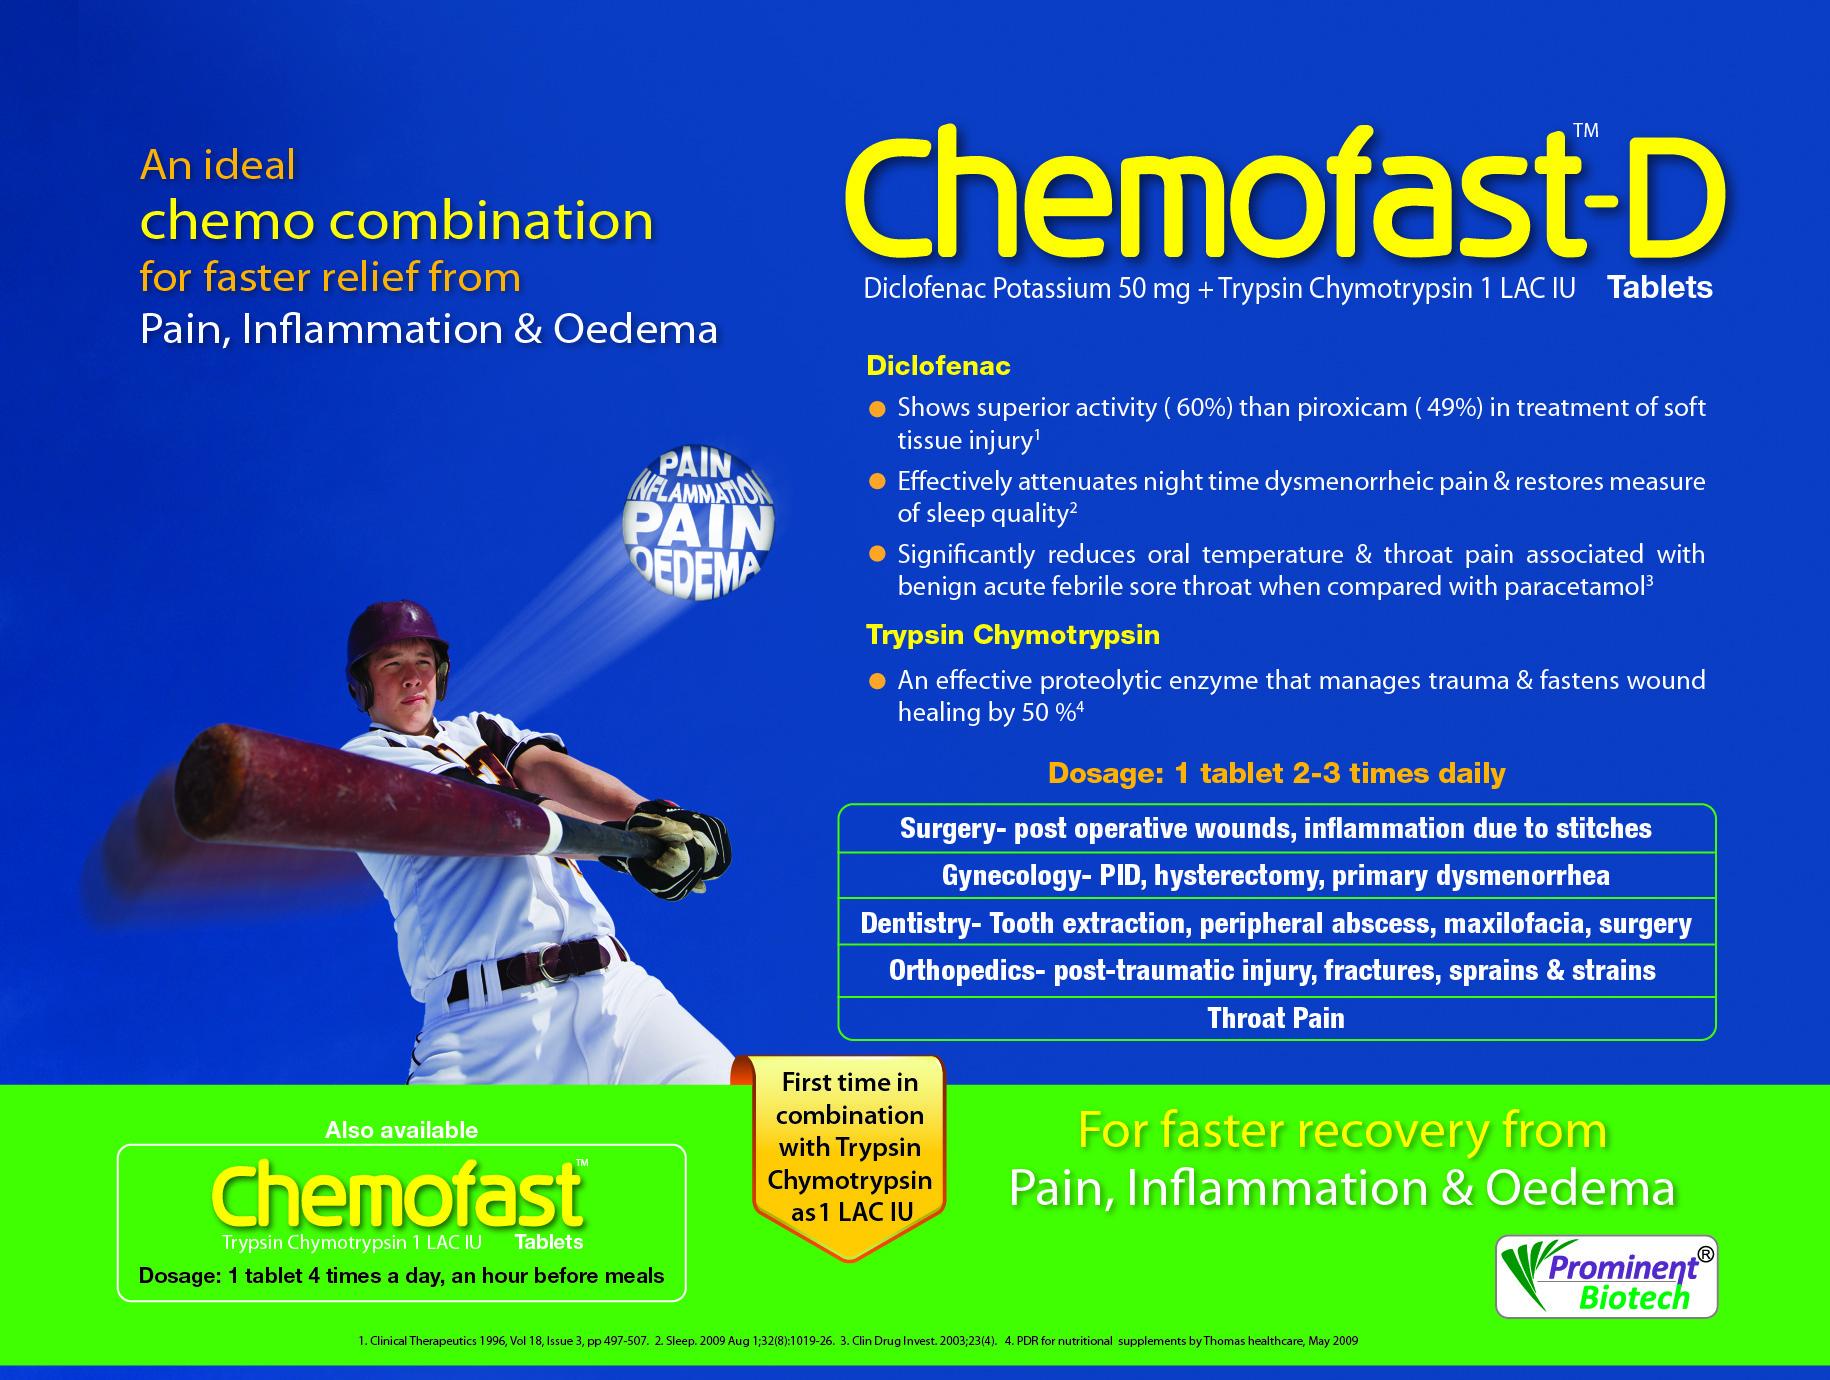 Diclofenac Potassium 50 mg & Trypsin-Chymotrypsin 1,00,000 IU Tablets